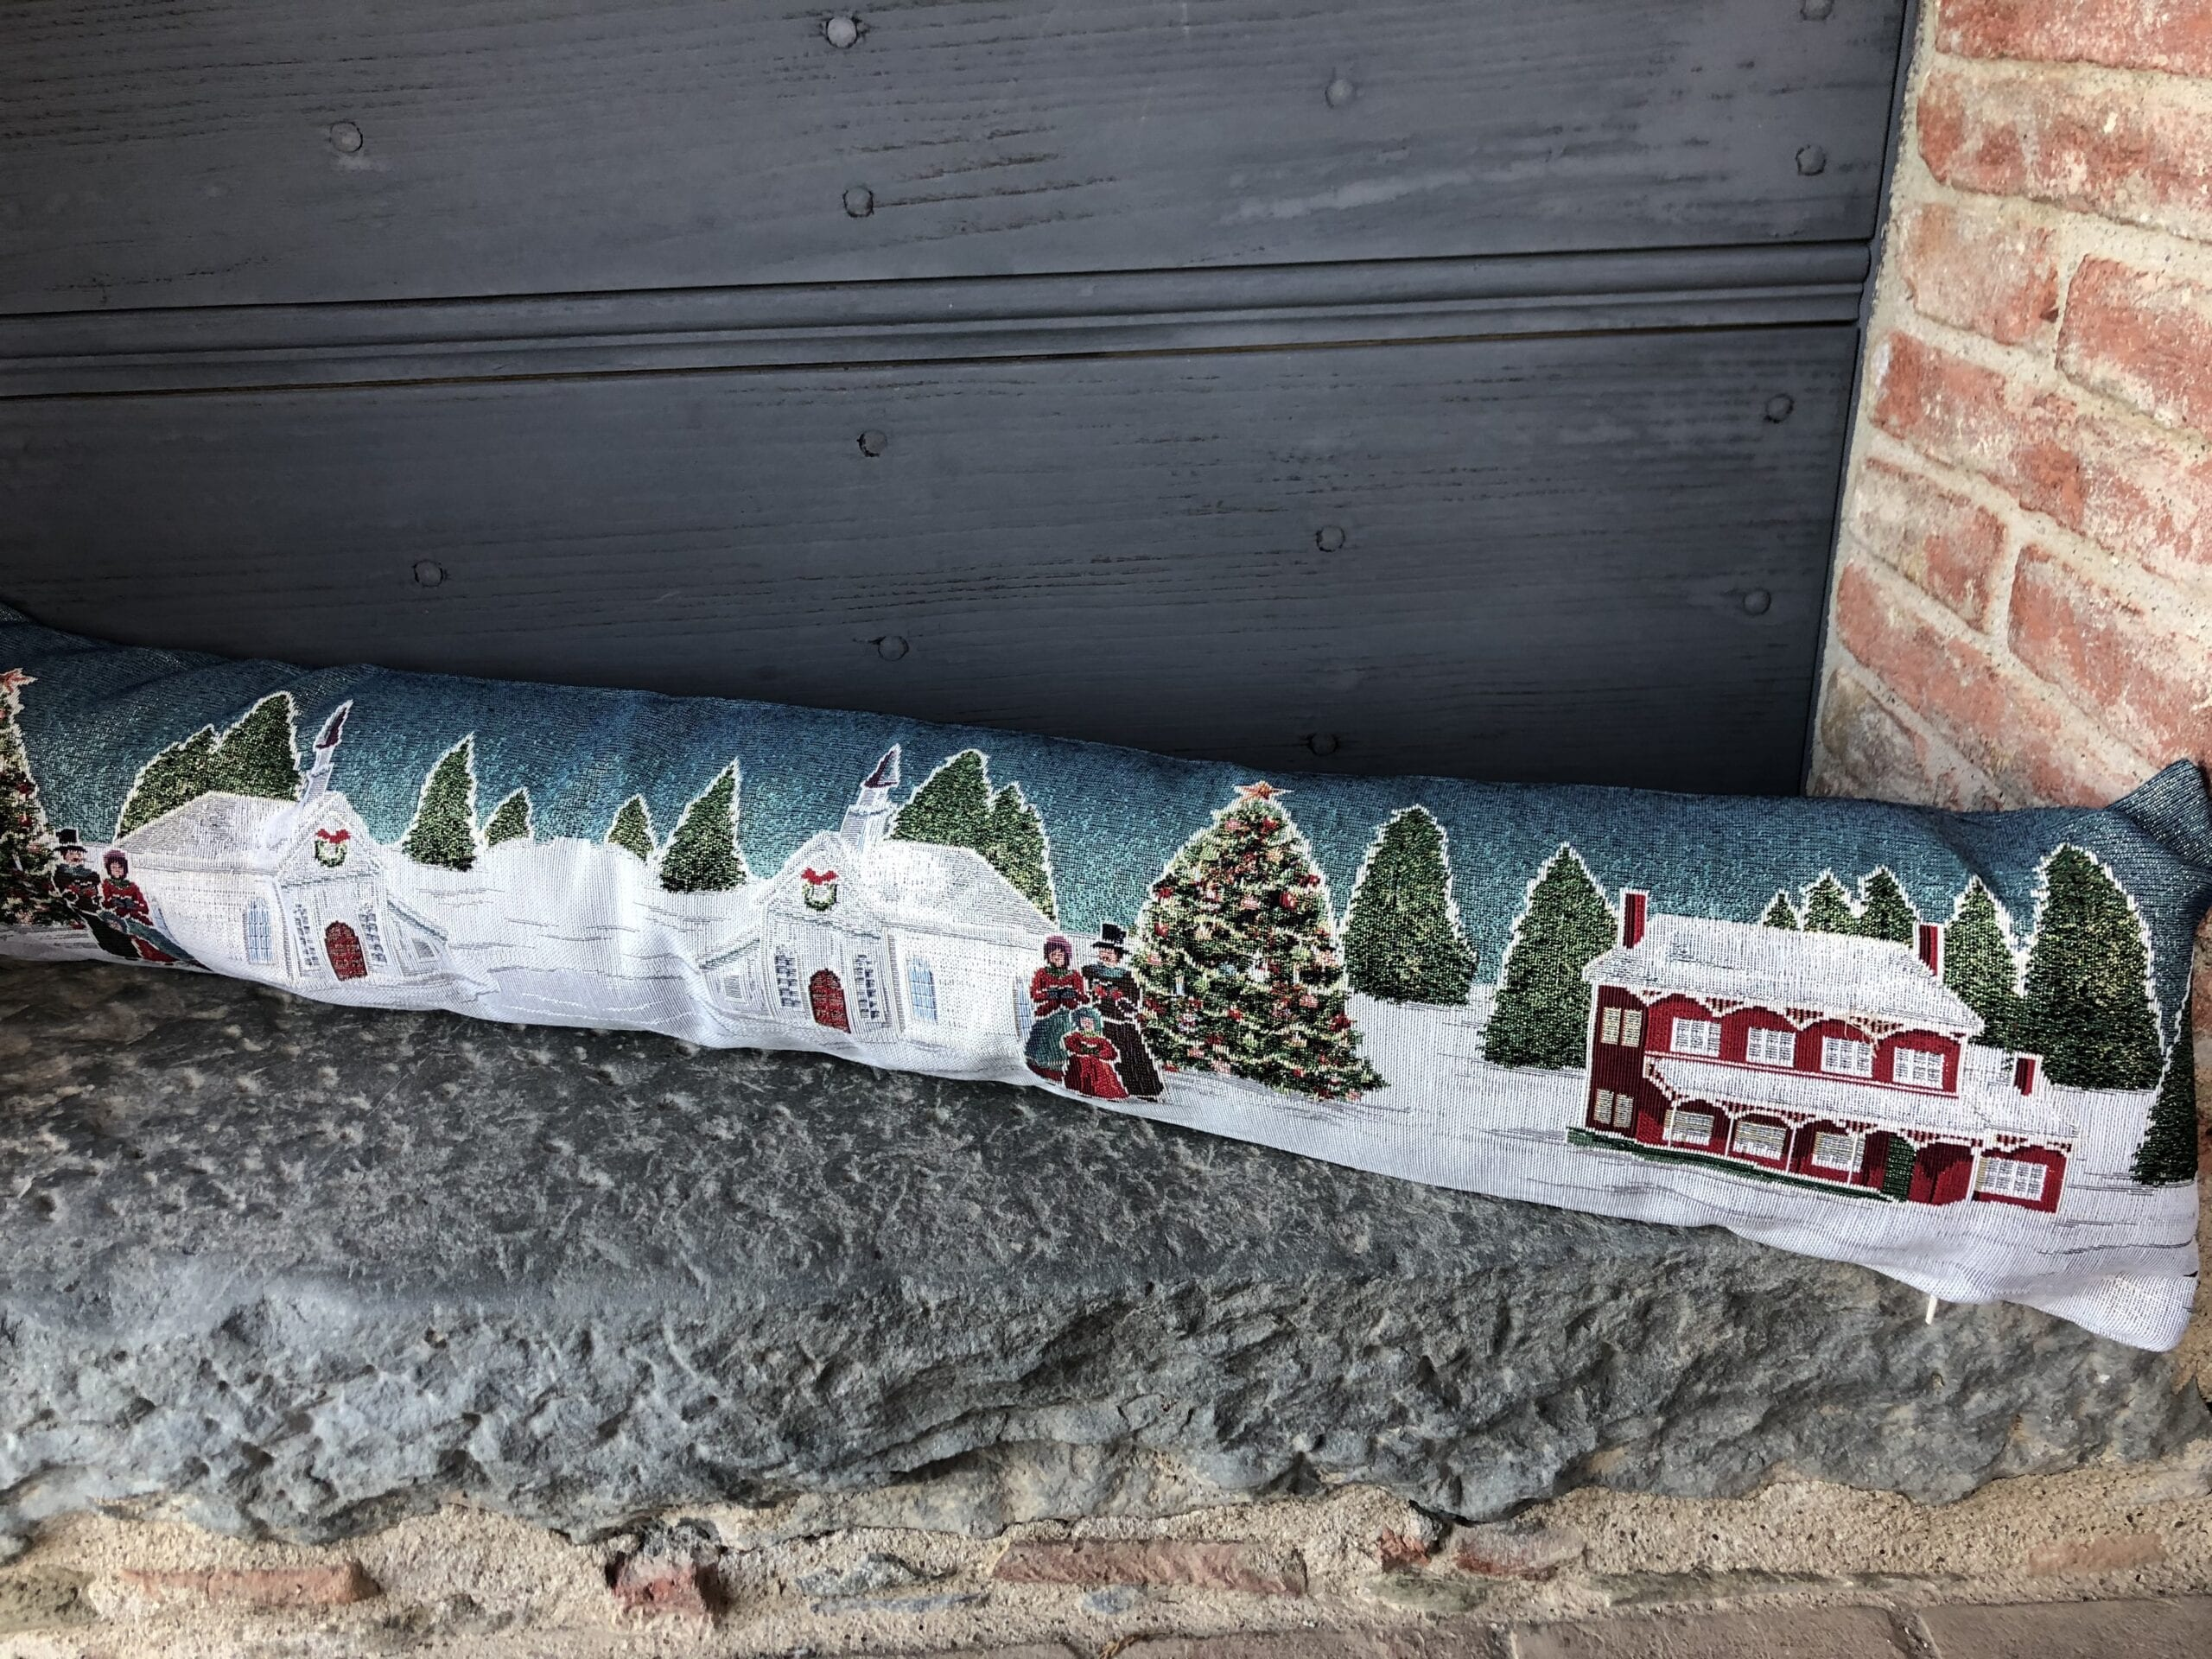 Paraspifferi – Paesaggio natalizio con albero